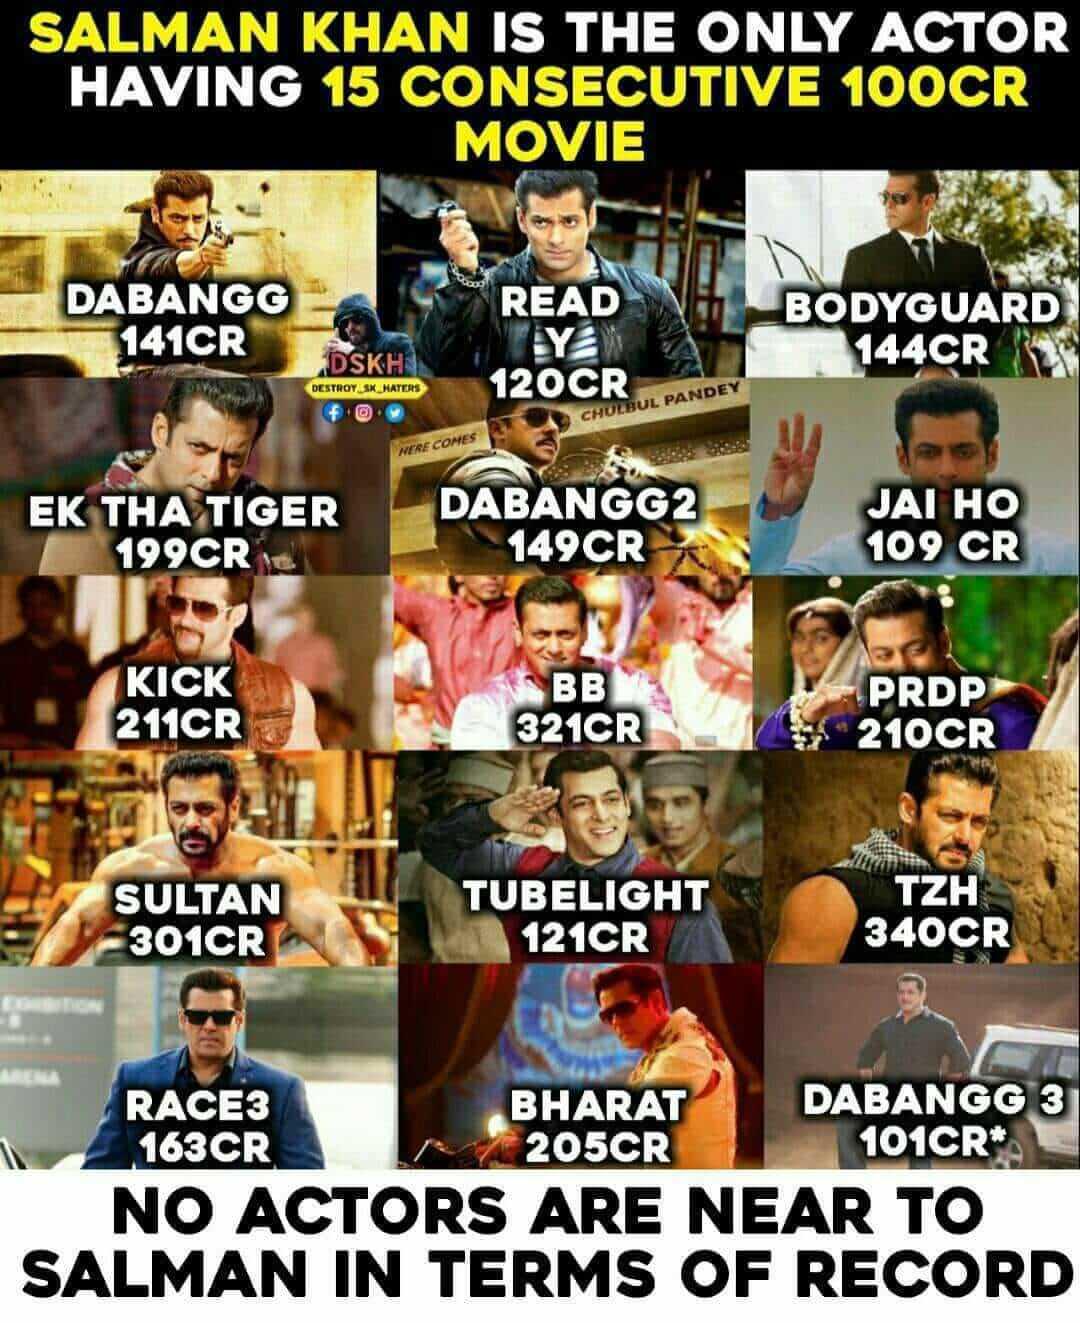 Salman Khan Photo, Age, News, Birthday, Height, Sister, Biography, Girlfriend, Awards, Address, Song, Video, Net Worth, Education, Twitter, Instagram, Facebook, Wiki, Imdb, Website, Youtube (32)